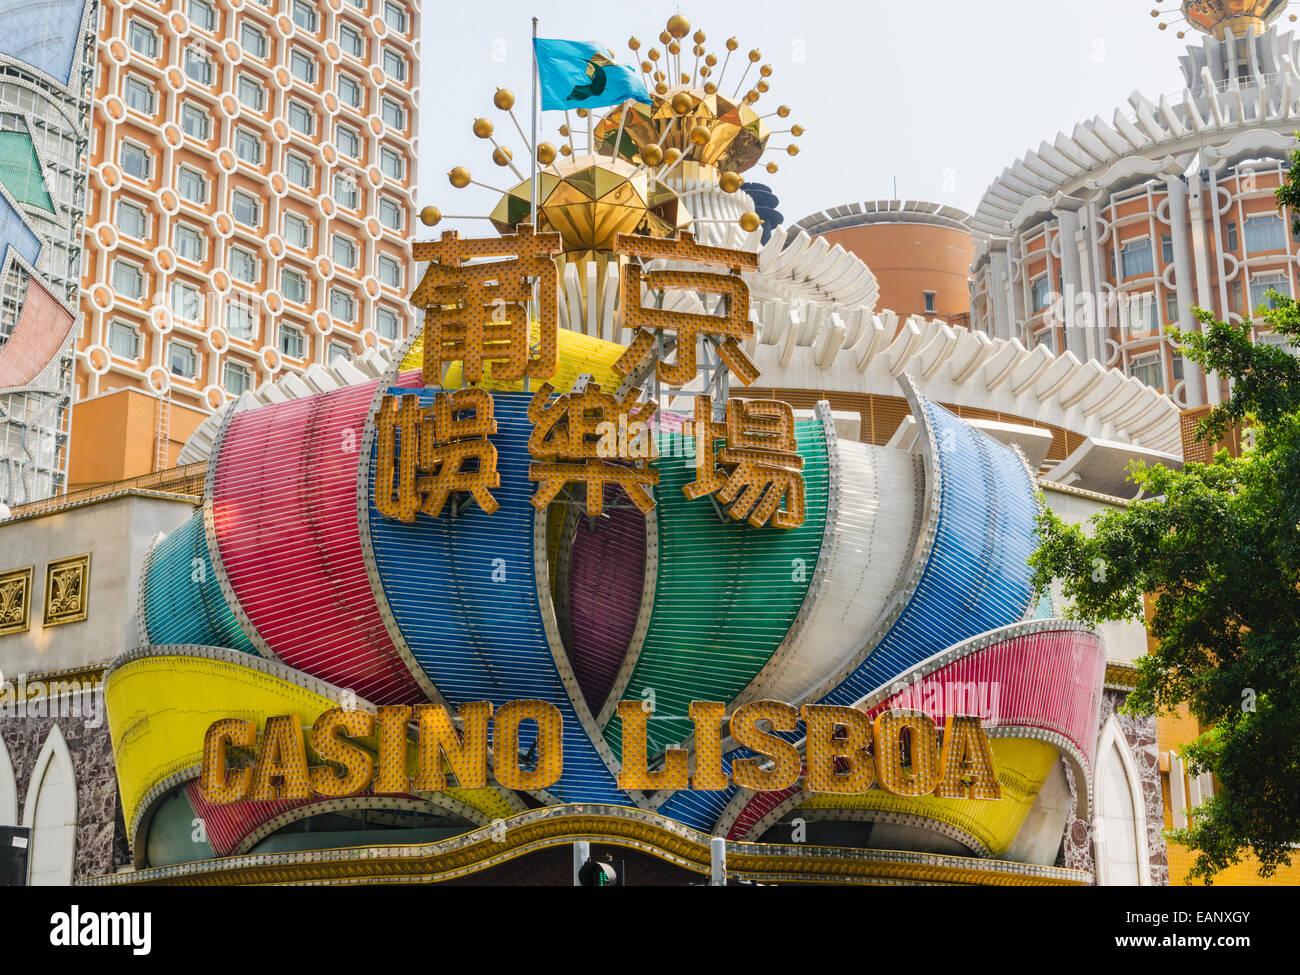 Casino Lisboa ingresso, Macau, Cina Immagini Stock